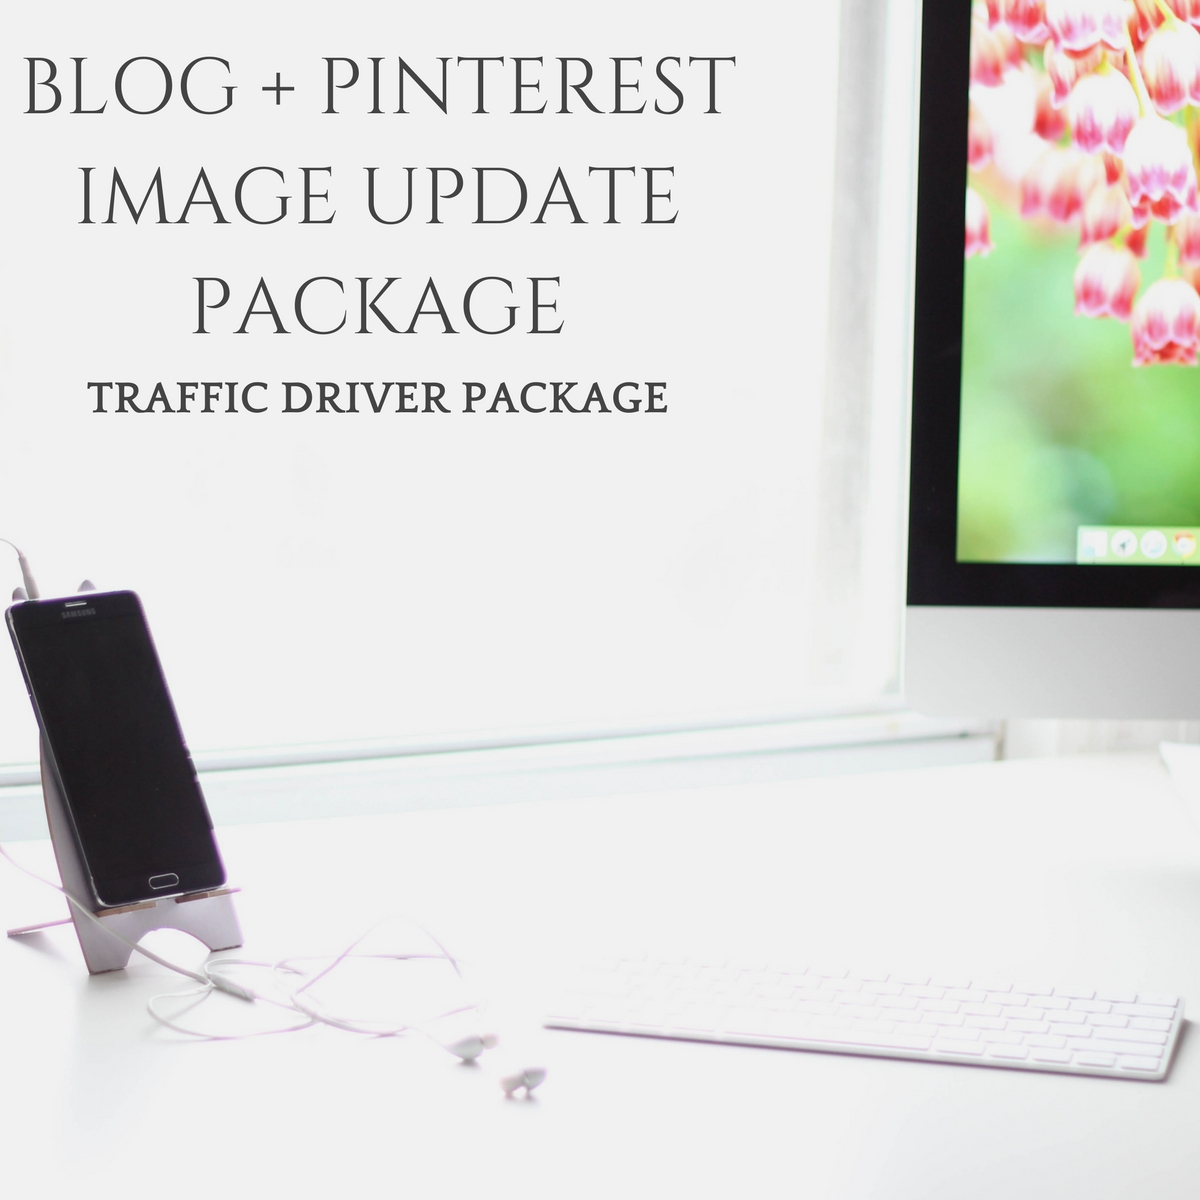 BLOG + PINTEREST IMAGE UPDATES - TRAFFIC DRIVER PACKAGE